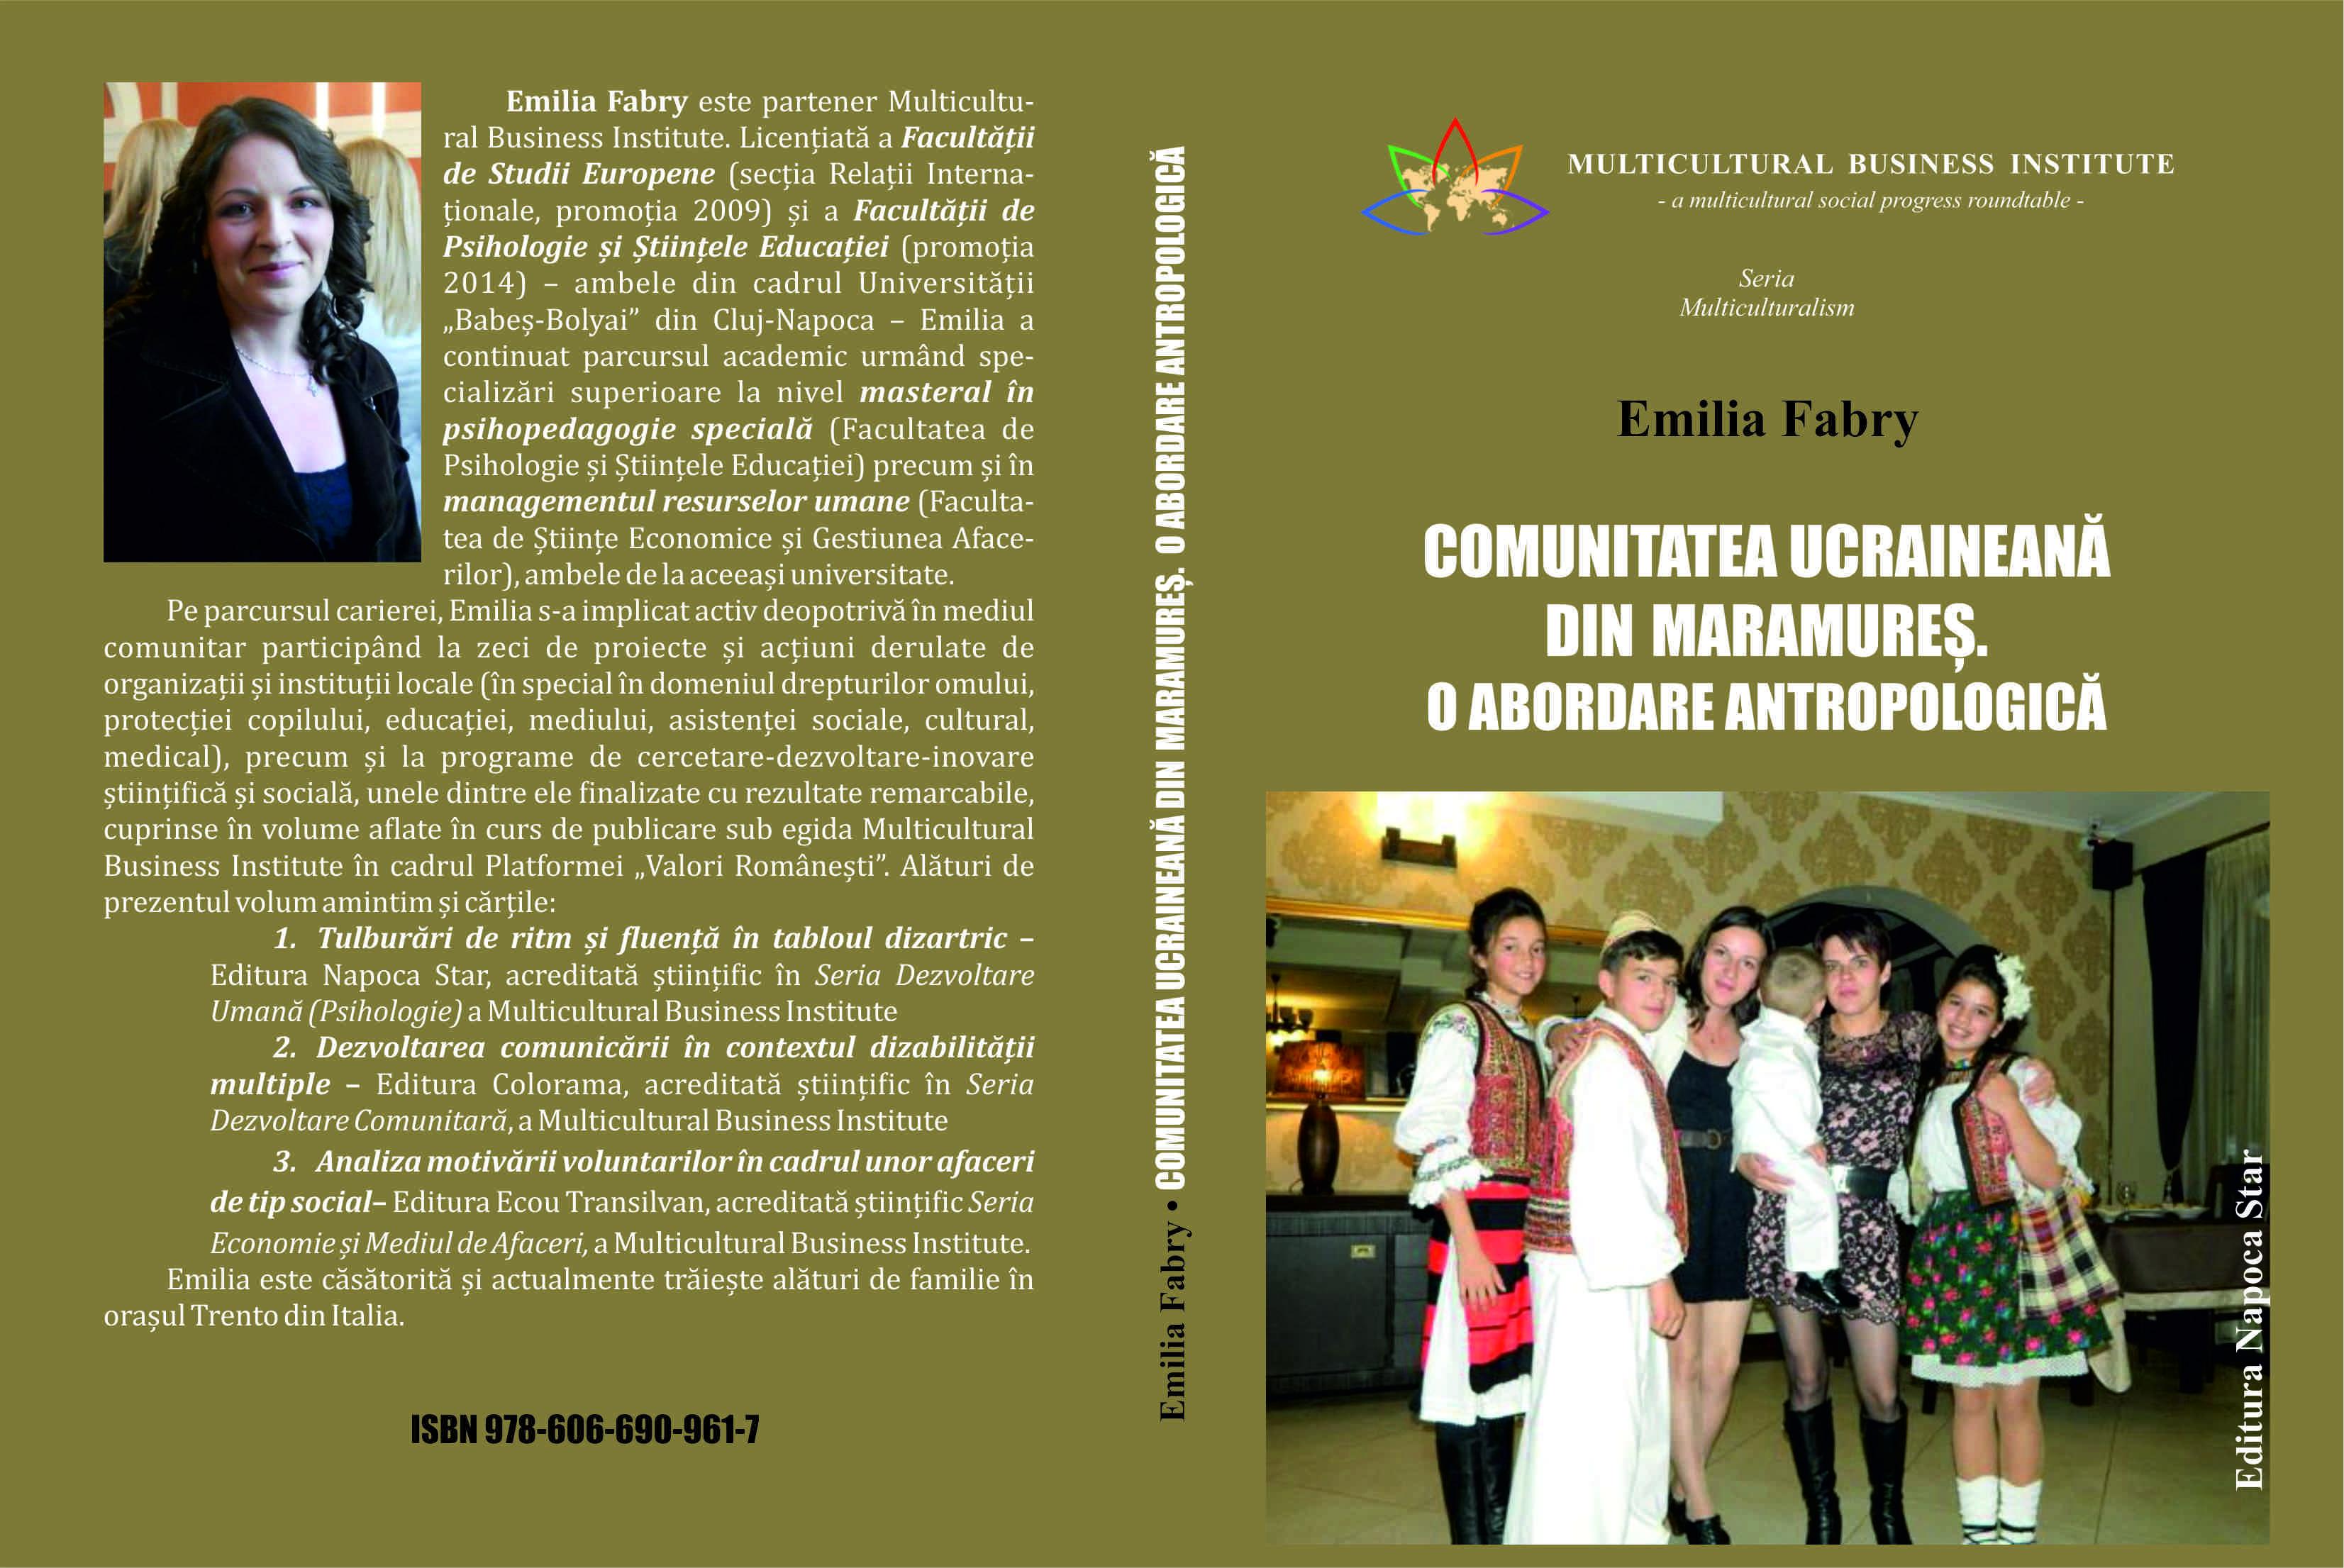 Comunitatea ucrainiană - Emilia Fabry